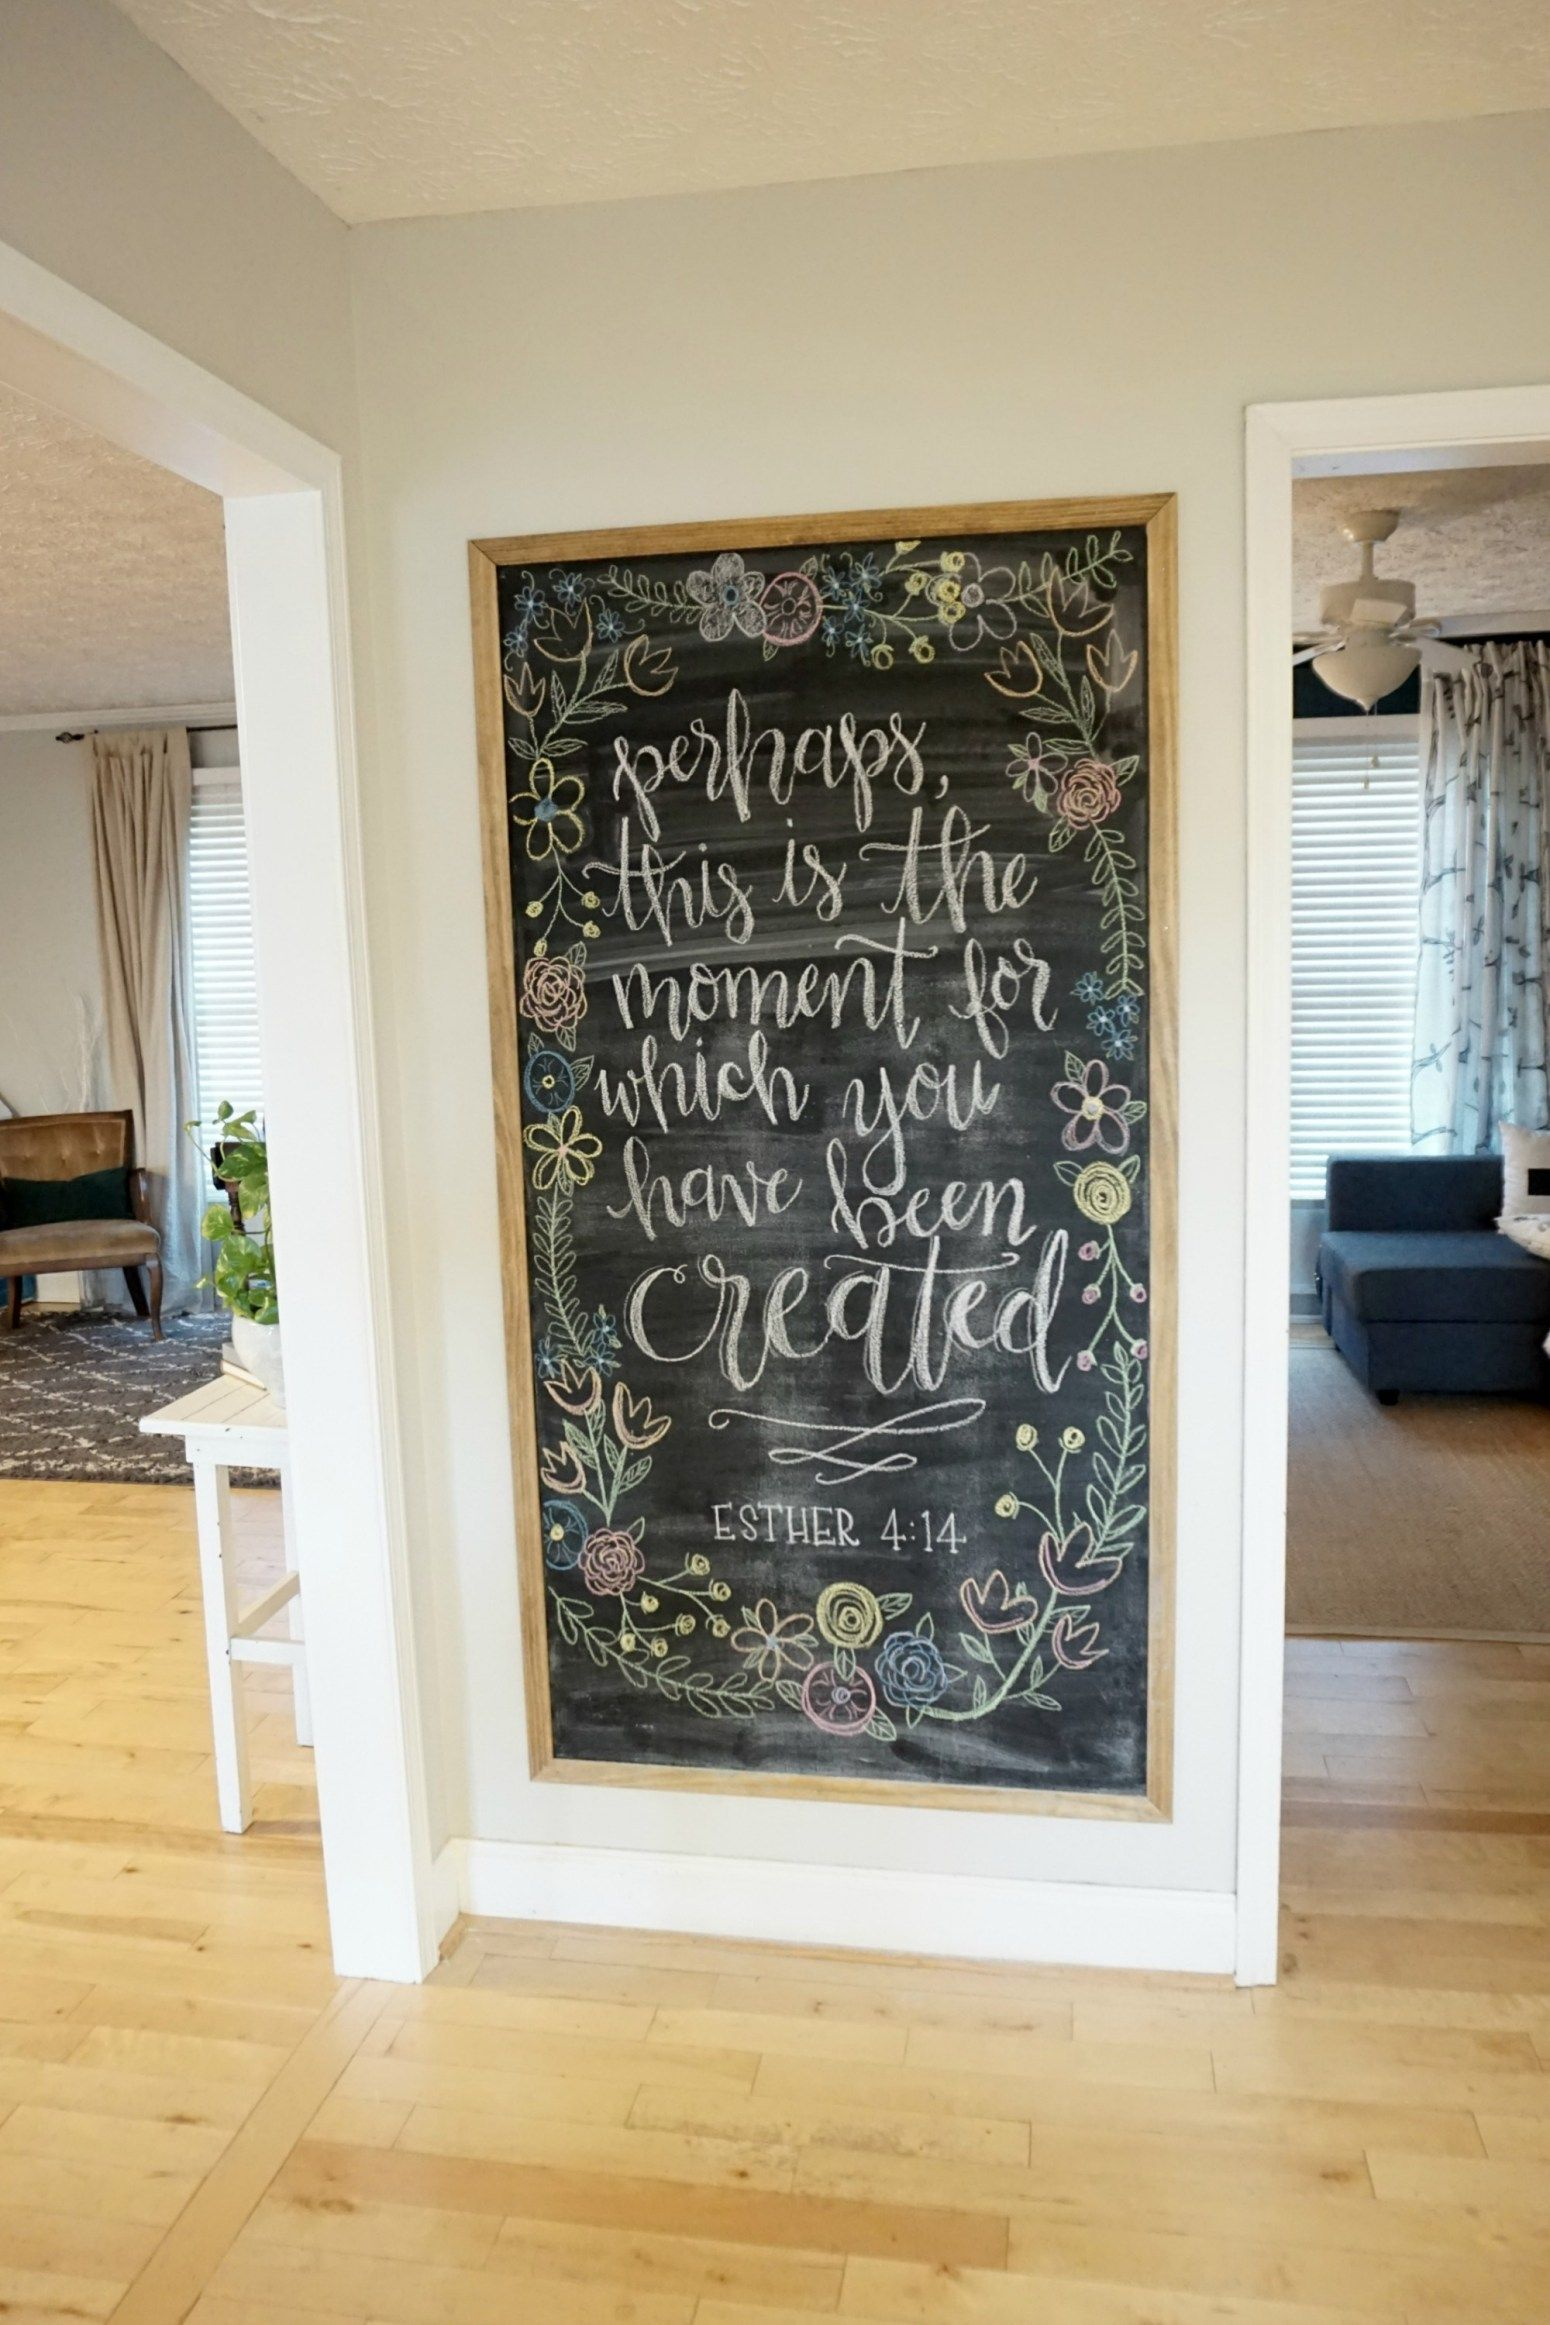 12 Affordable Ideas for Large Wall Decor | Diy chalkboard ...